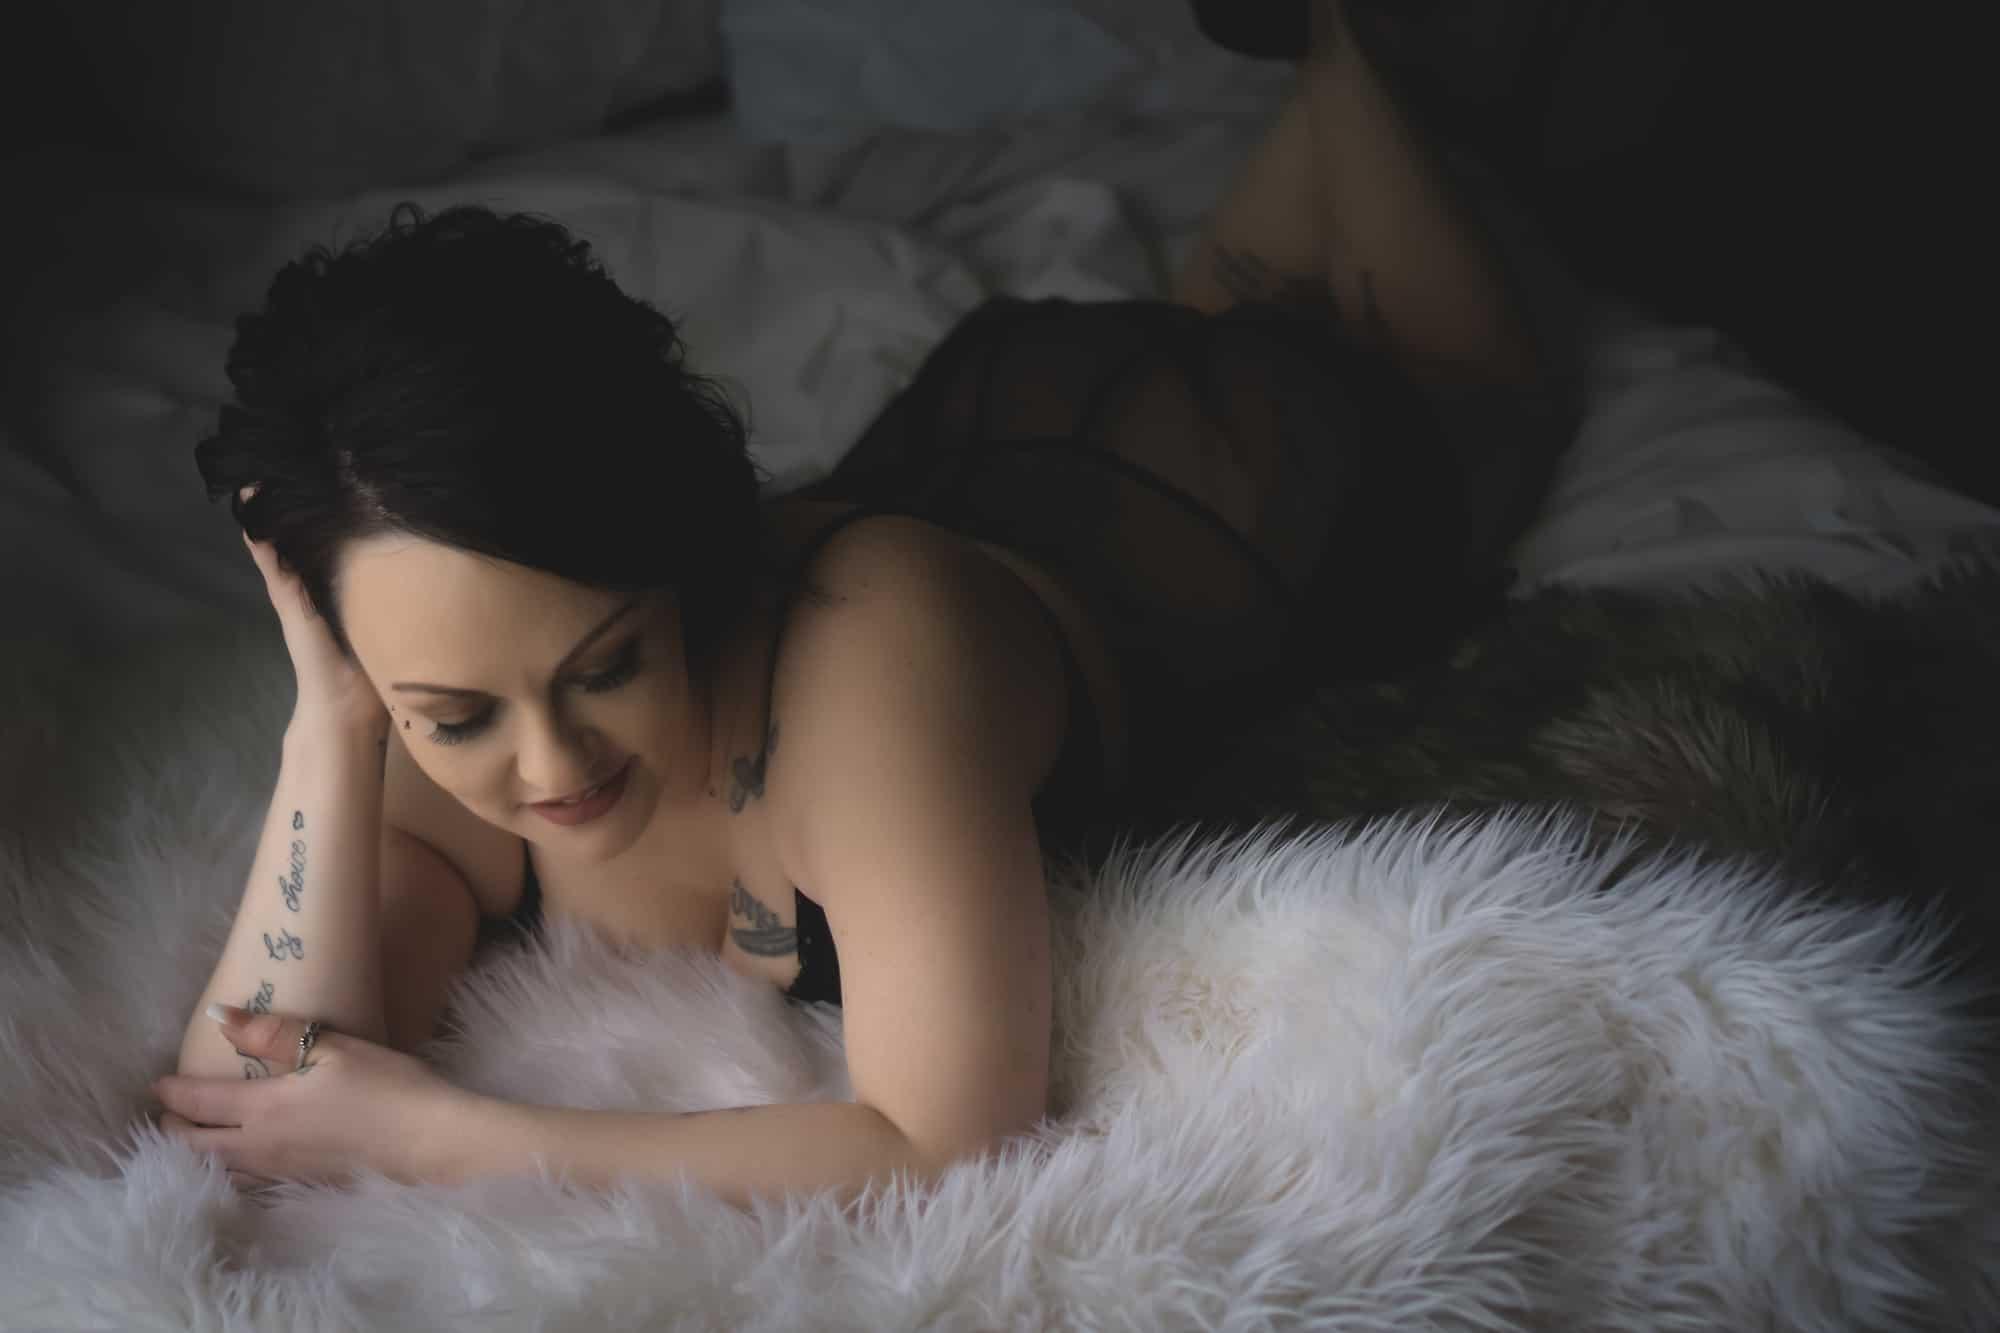 fort wayne boudoir, boudoir photographer, best boudoir photograper, boudoir photographer near me, sexy pictures near me, boudoir pics, professional boudoir photographer